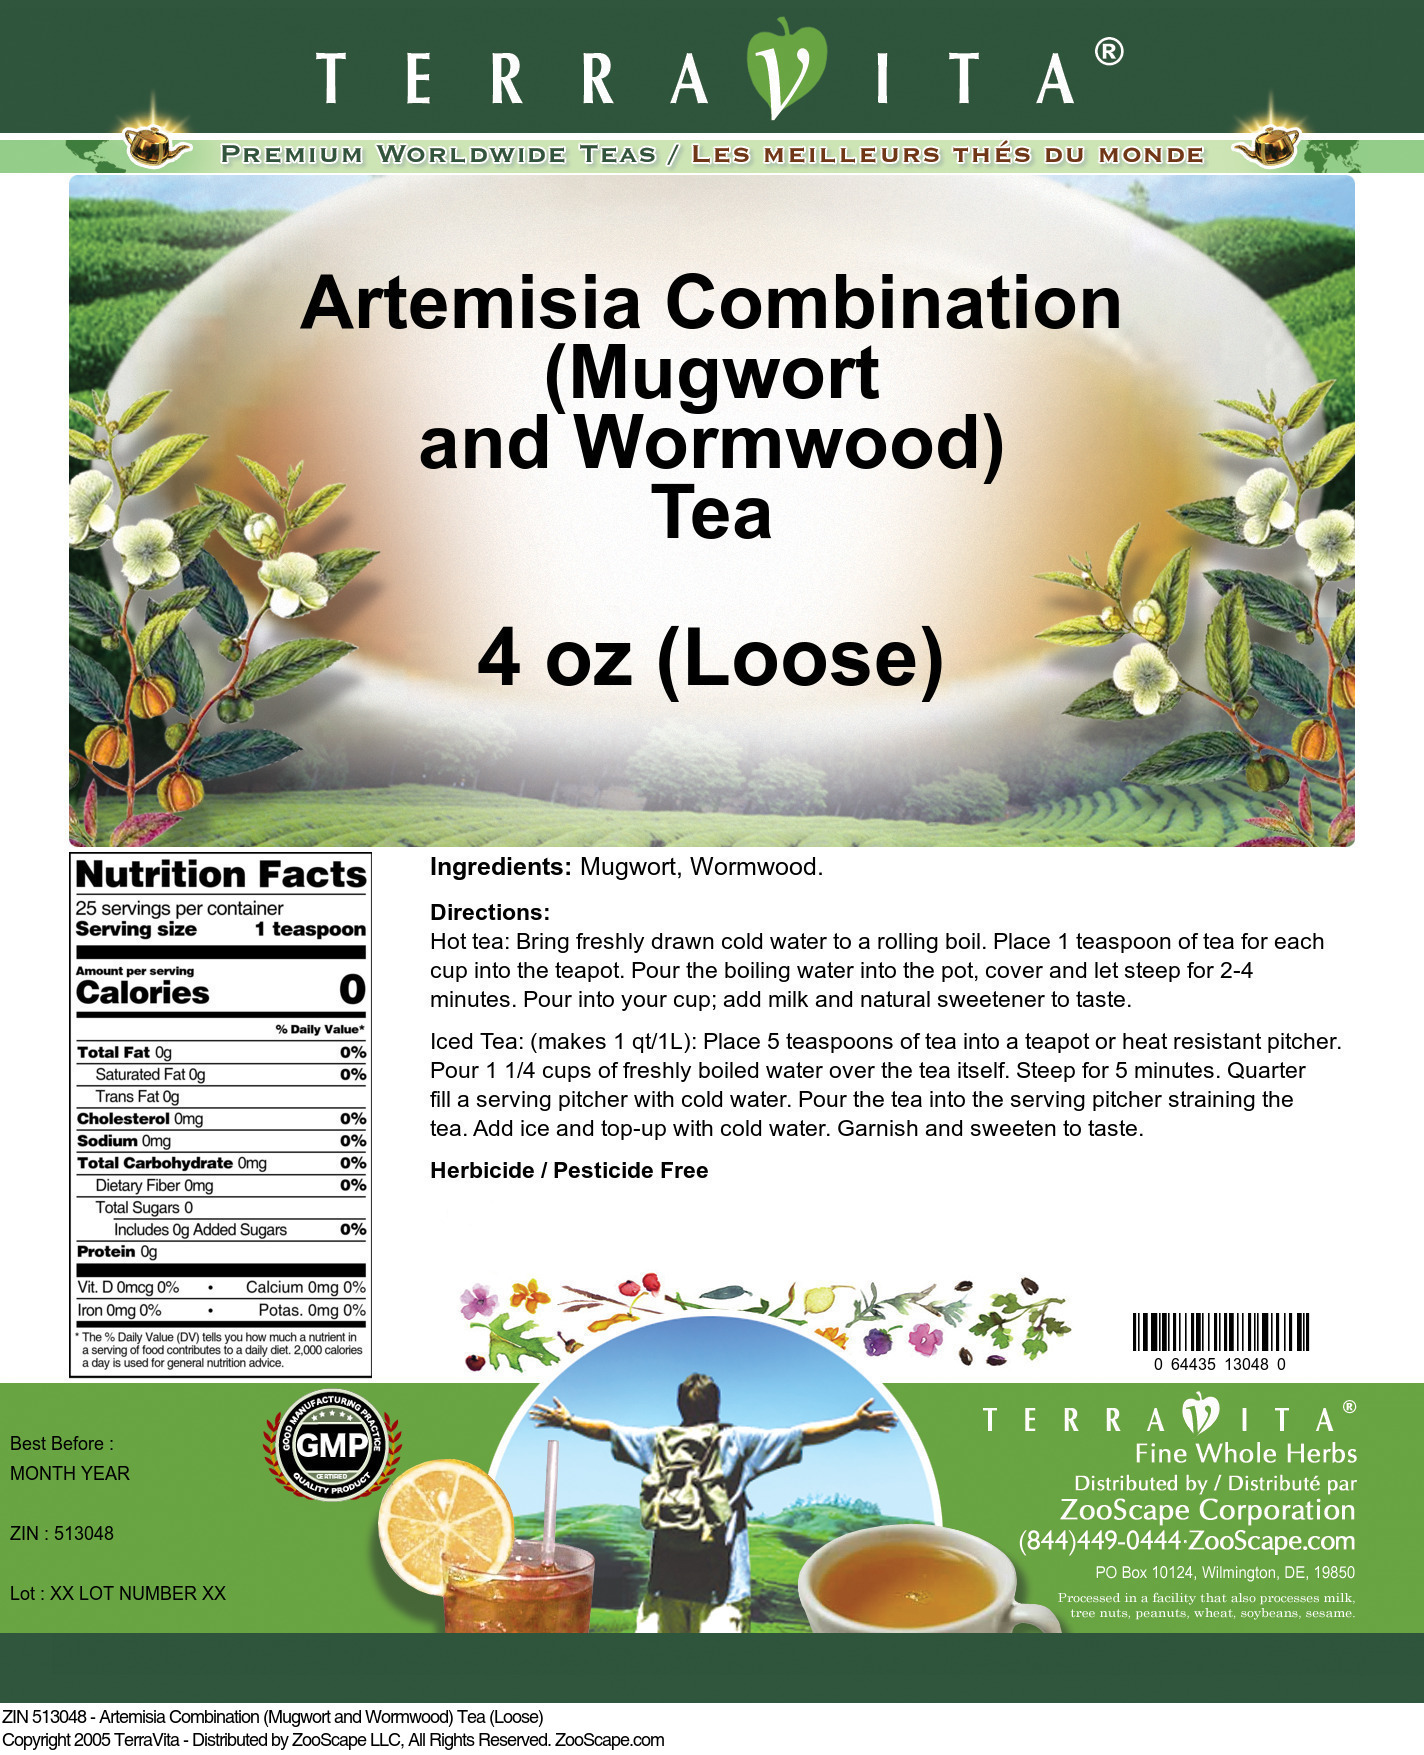 Artemisia Combination (Mugwort and Wormwood) Tea (Loose)